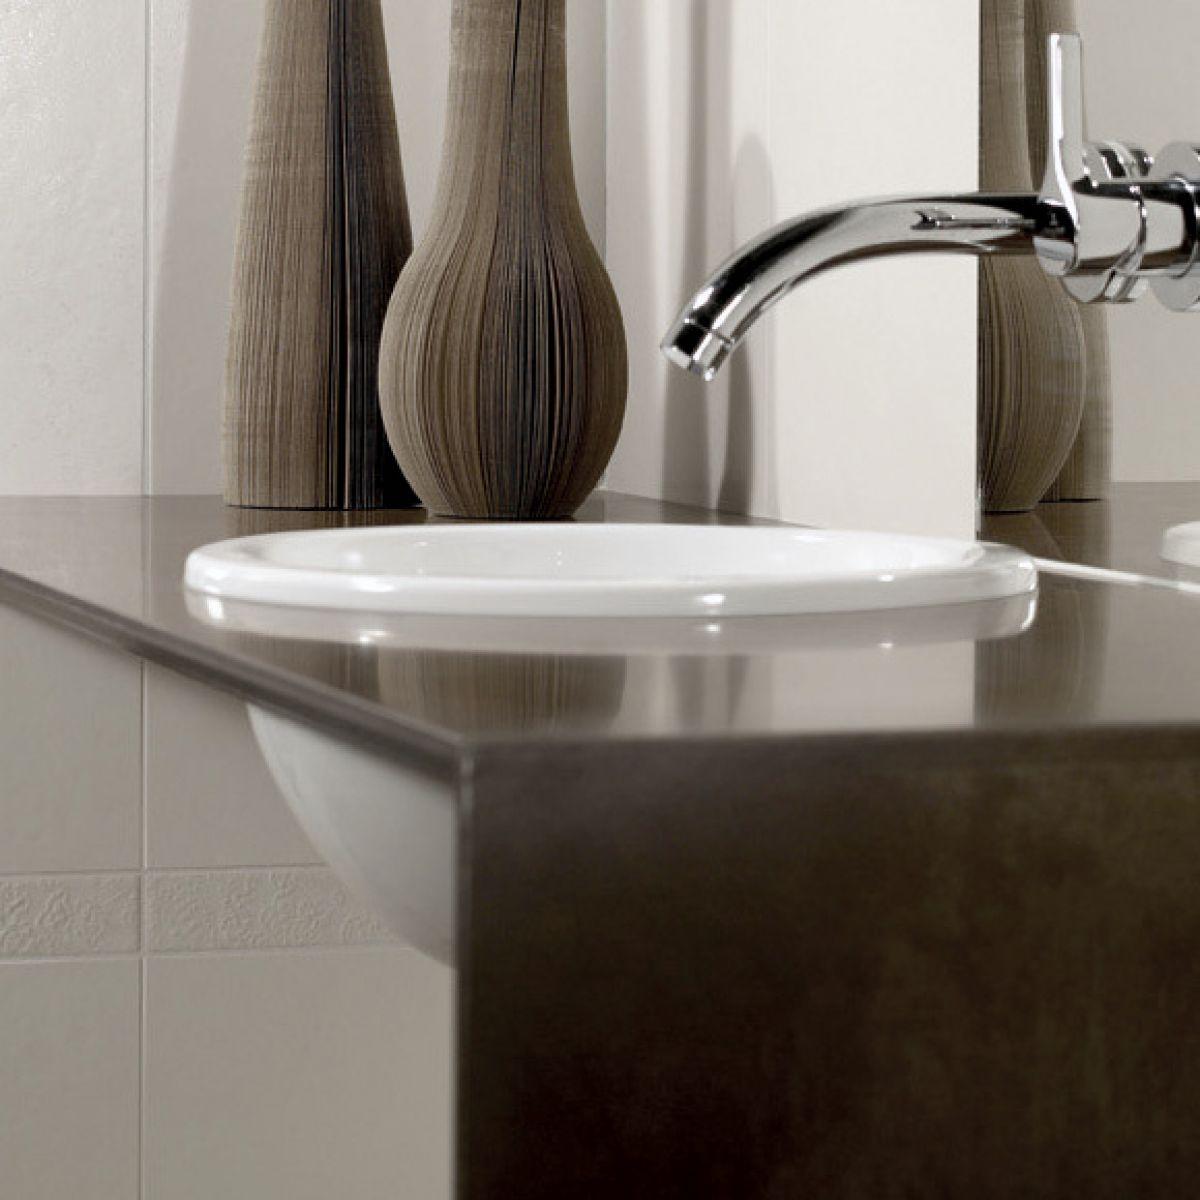 v b loop friends circular semi surface mounted washbasin. Black Bedroom Furniture Sets. Home Design Ideas